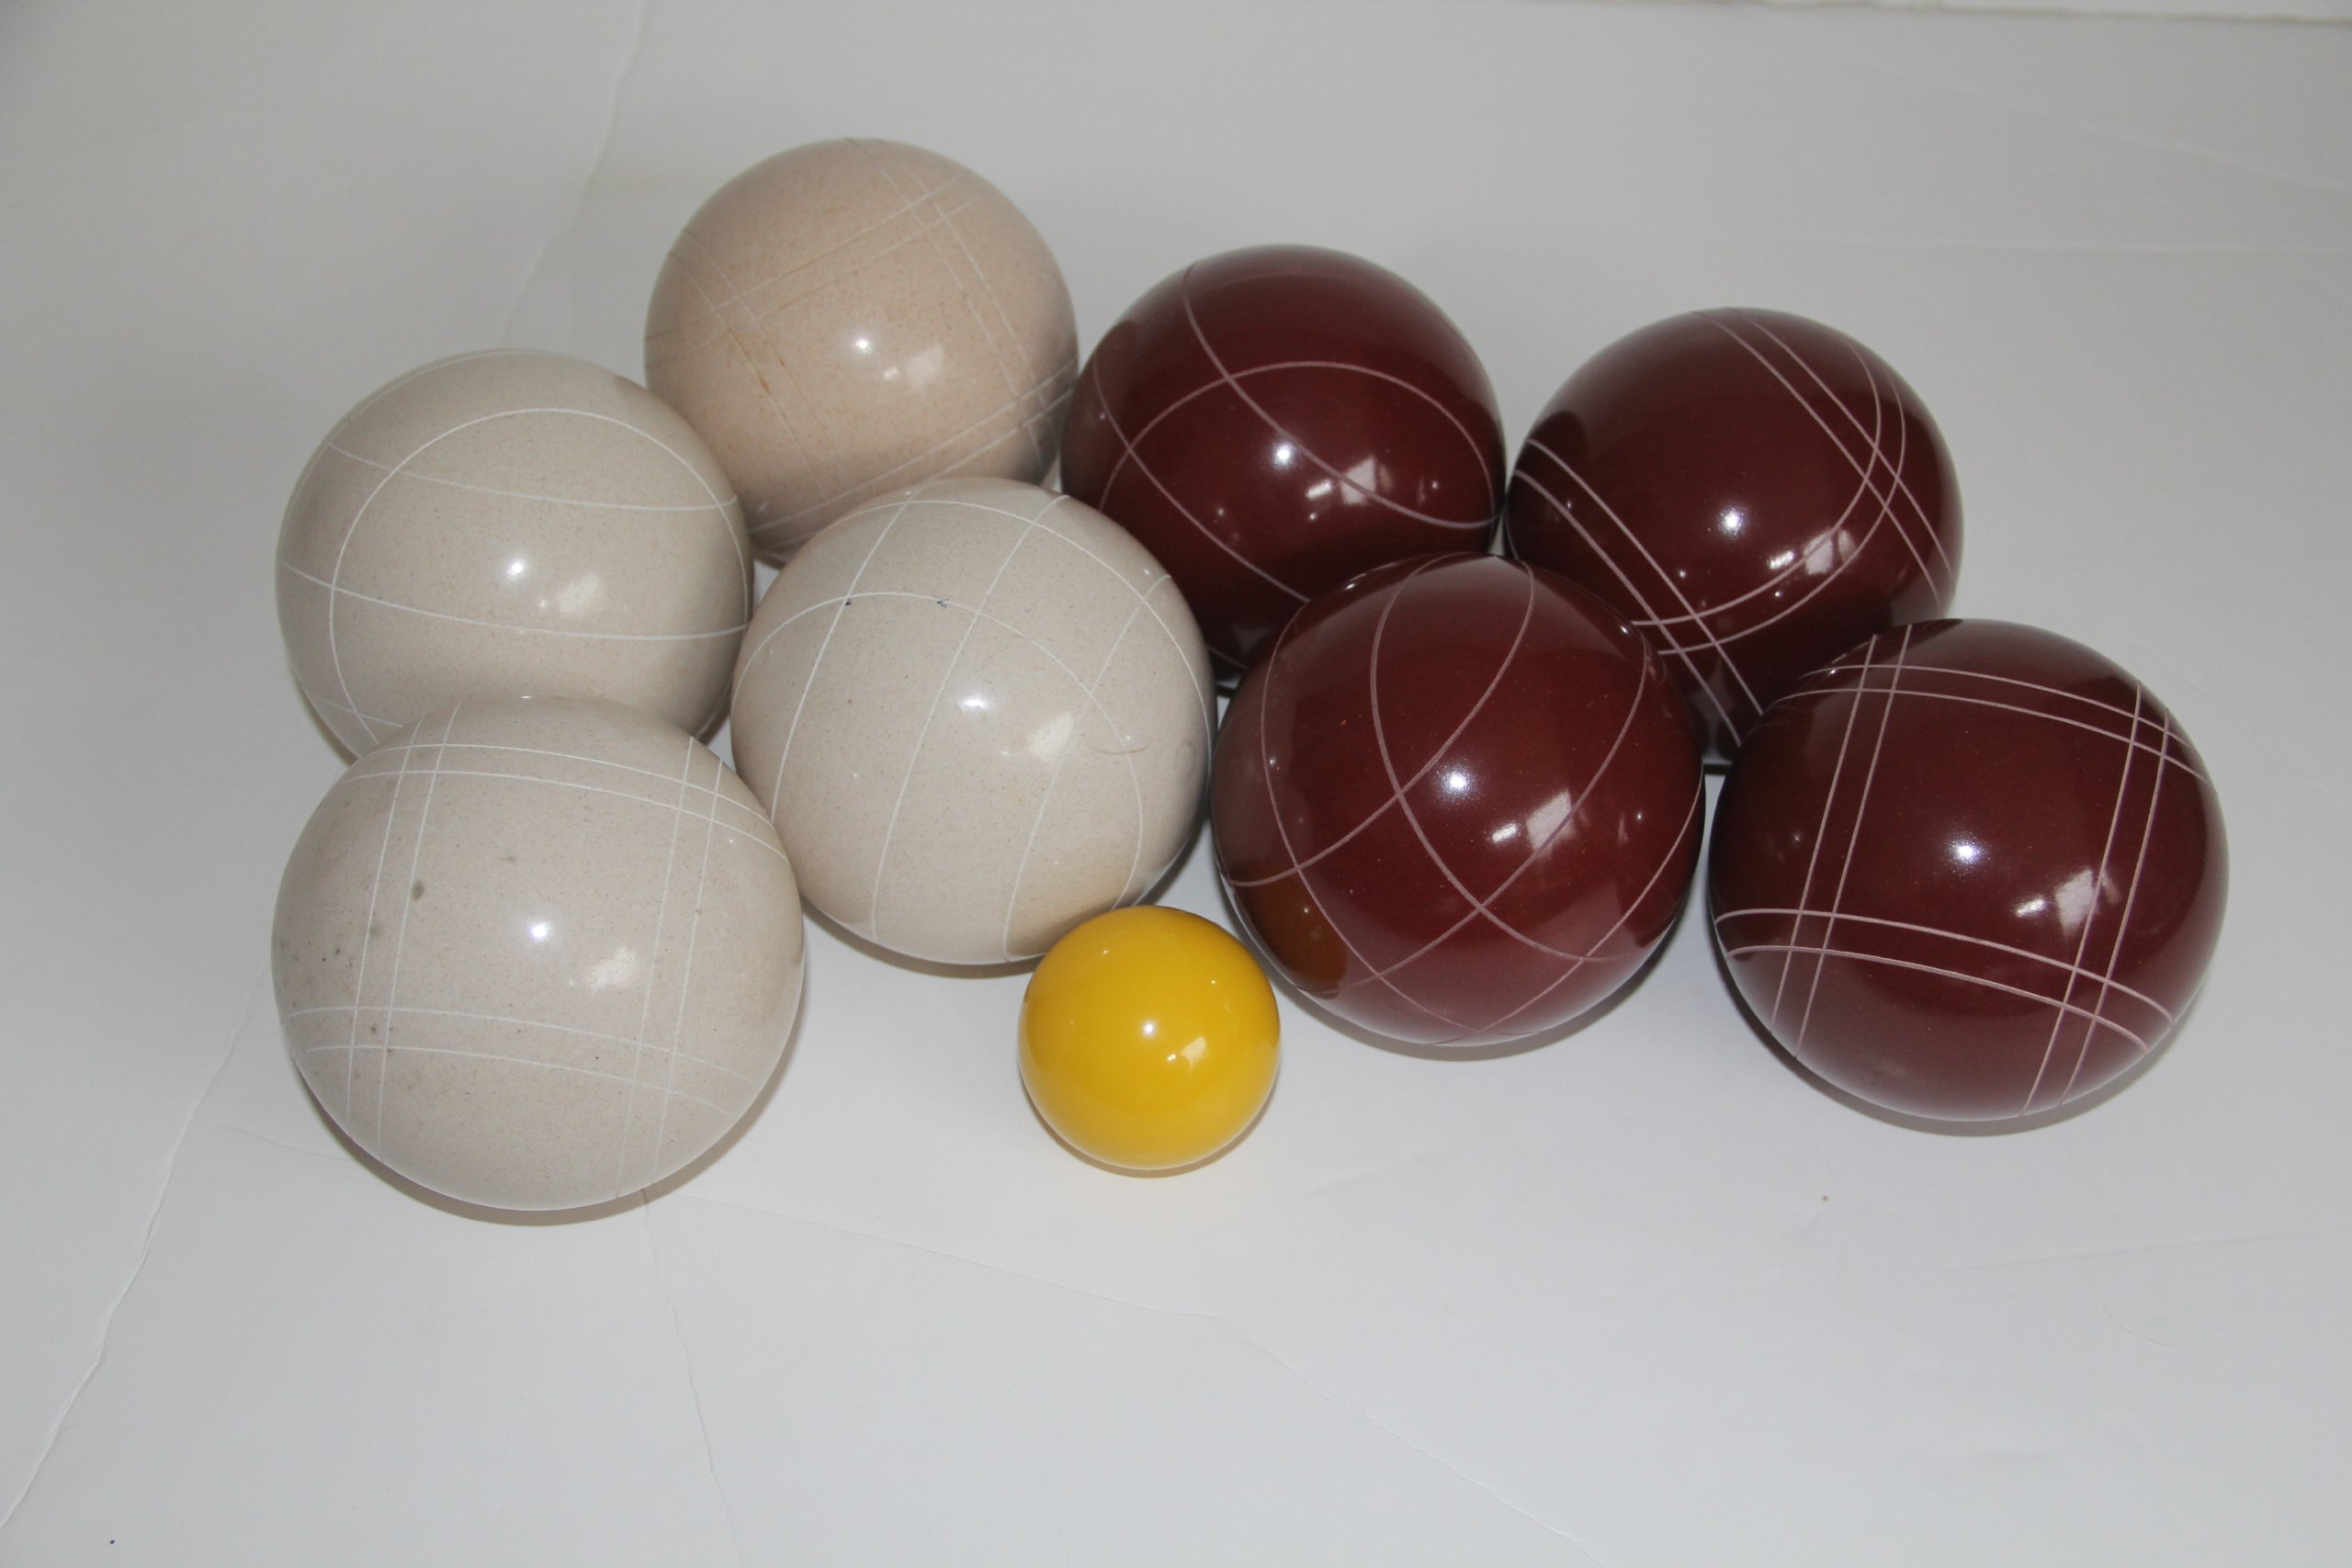 Premium Quality EPCO Tournament Set - 110mm Red and White Bocce Balls - NO BAG OPTION [Toy]